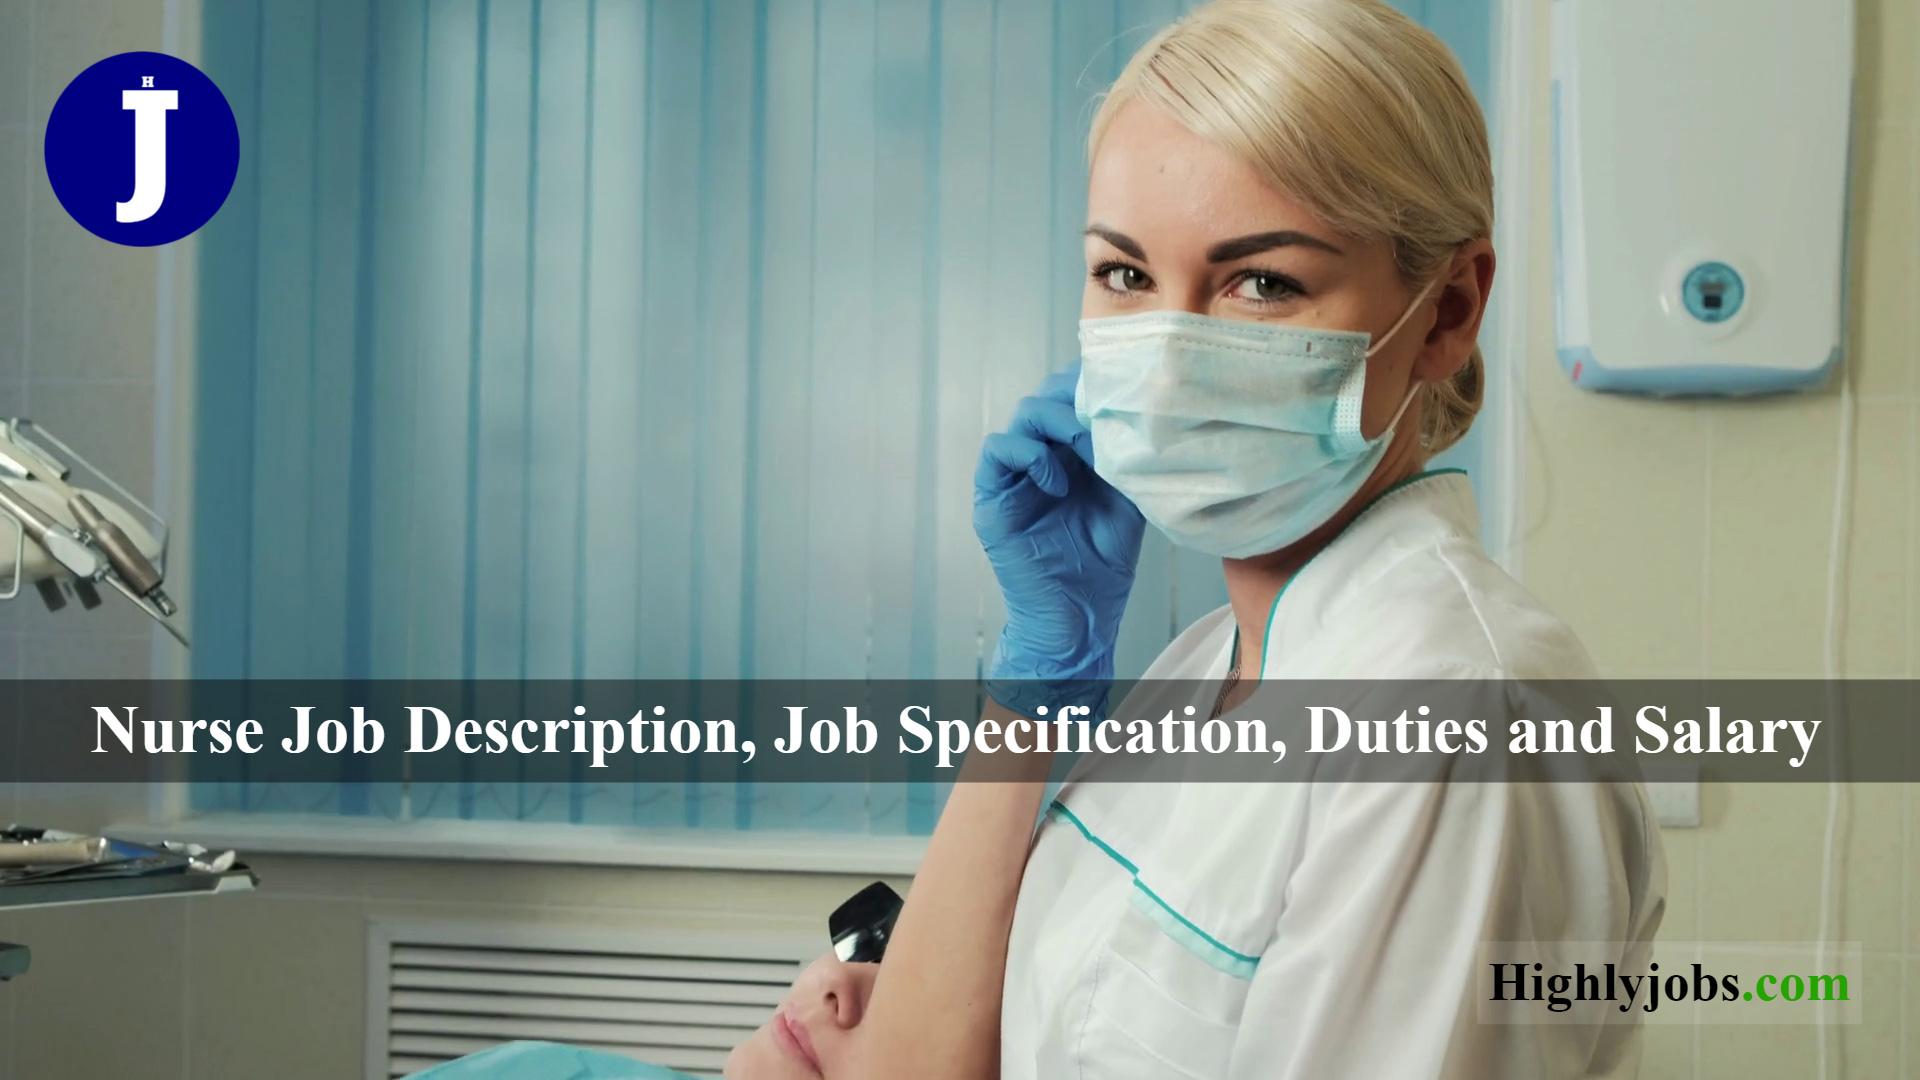 Nurse Job Description, Job Specification, Duties and Salary